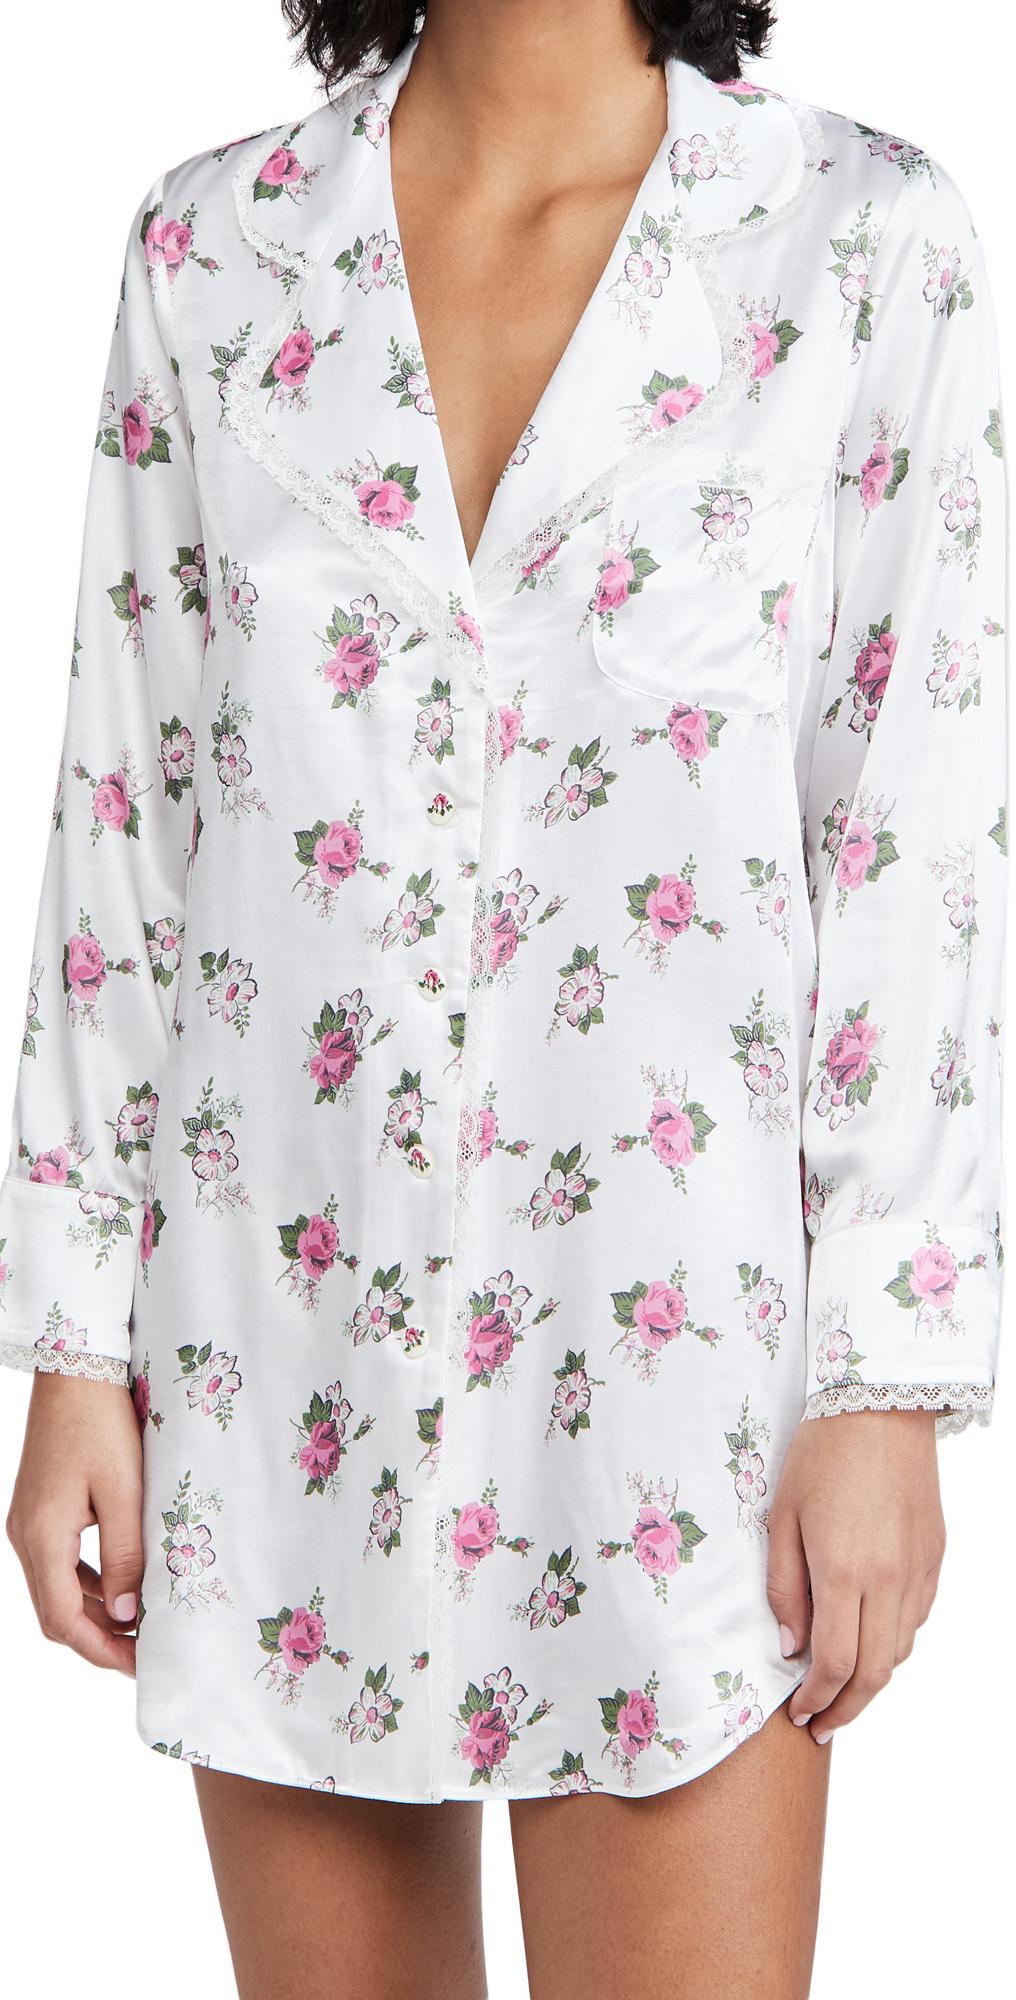 Morgan Lane x Love Shack Fancy Stacy Night Shirt